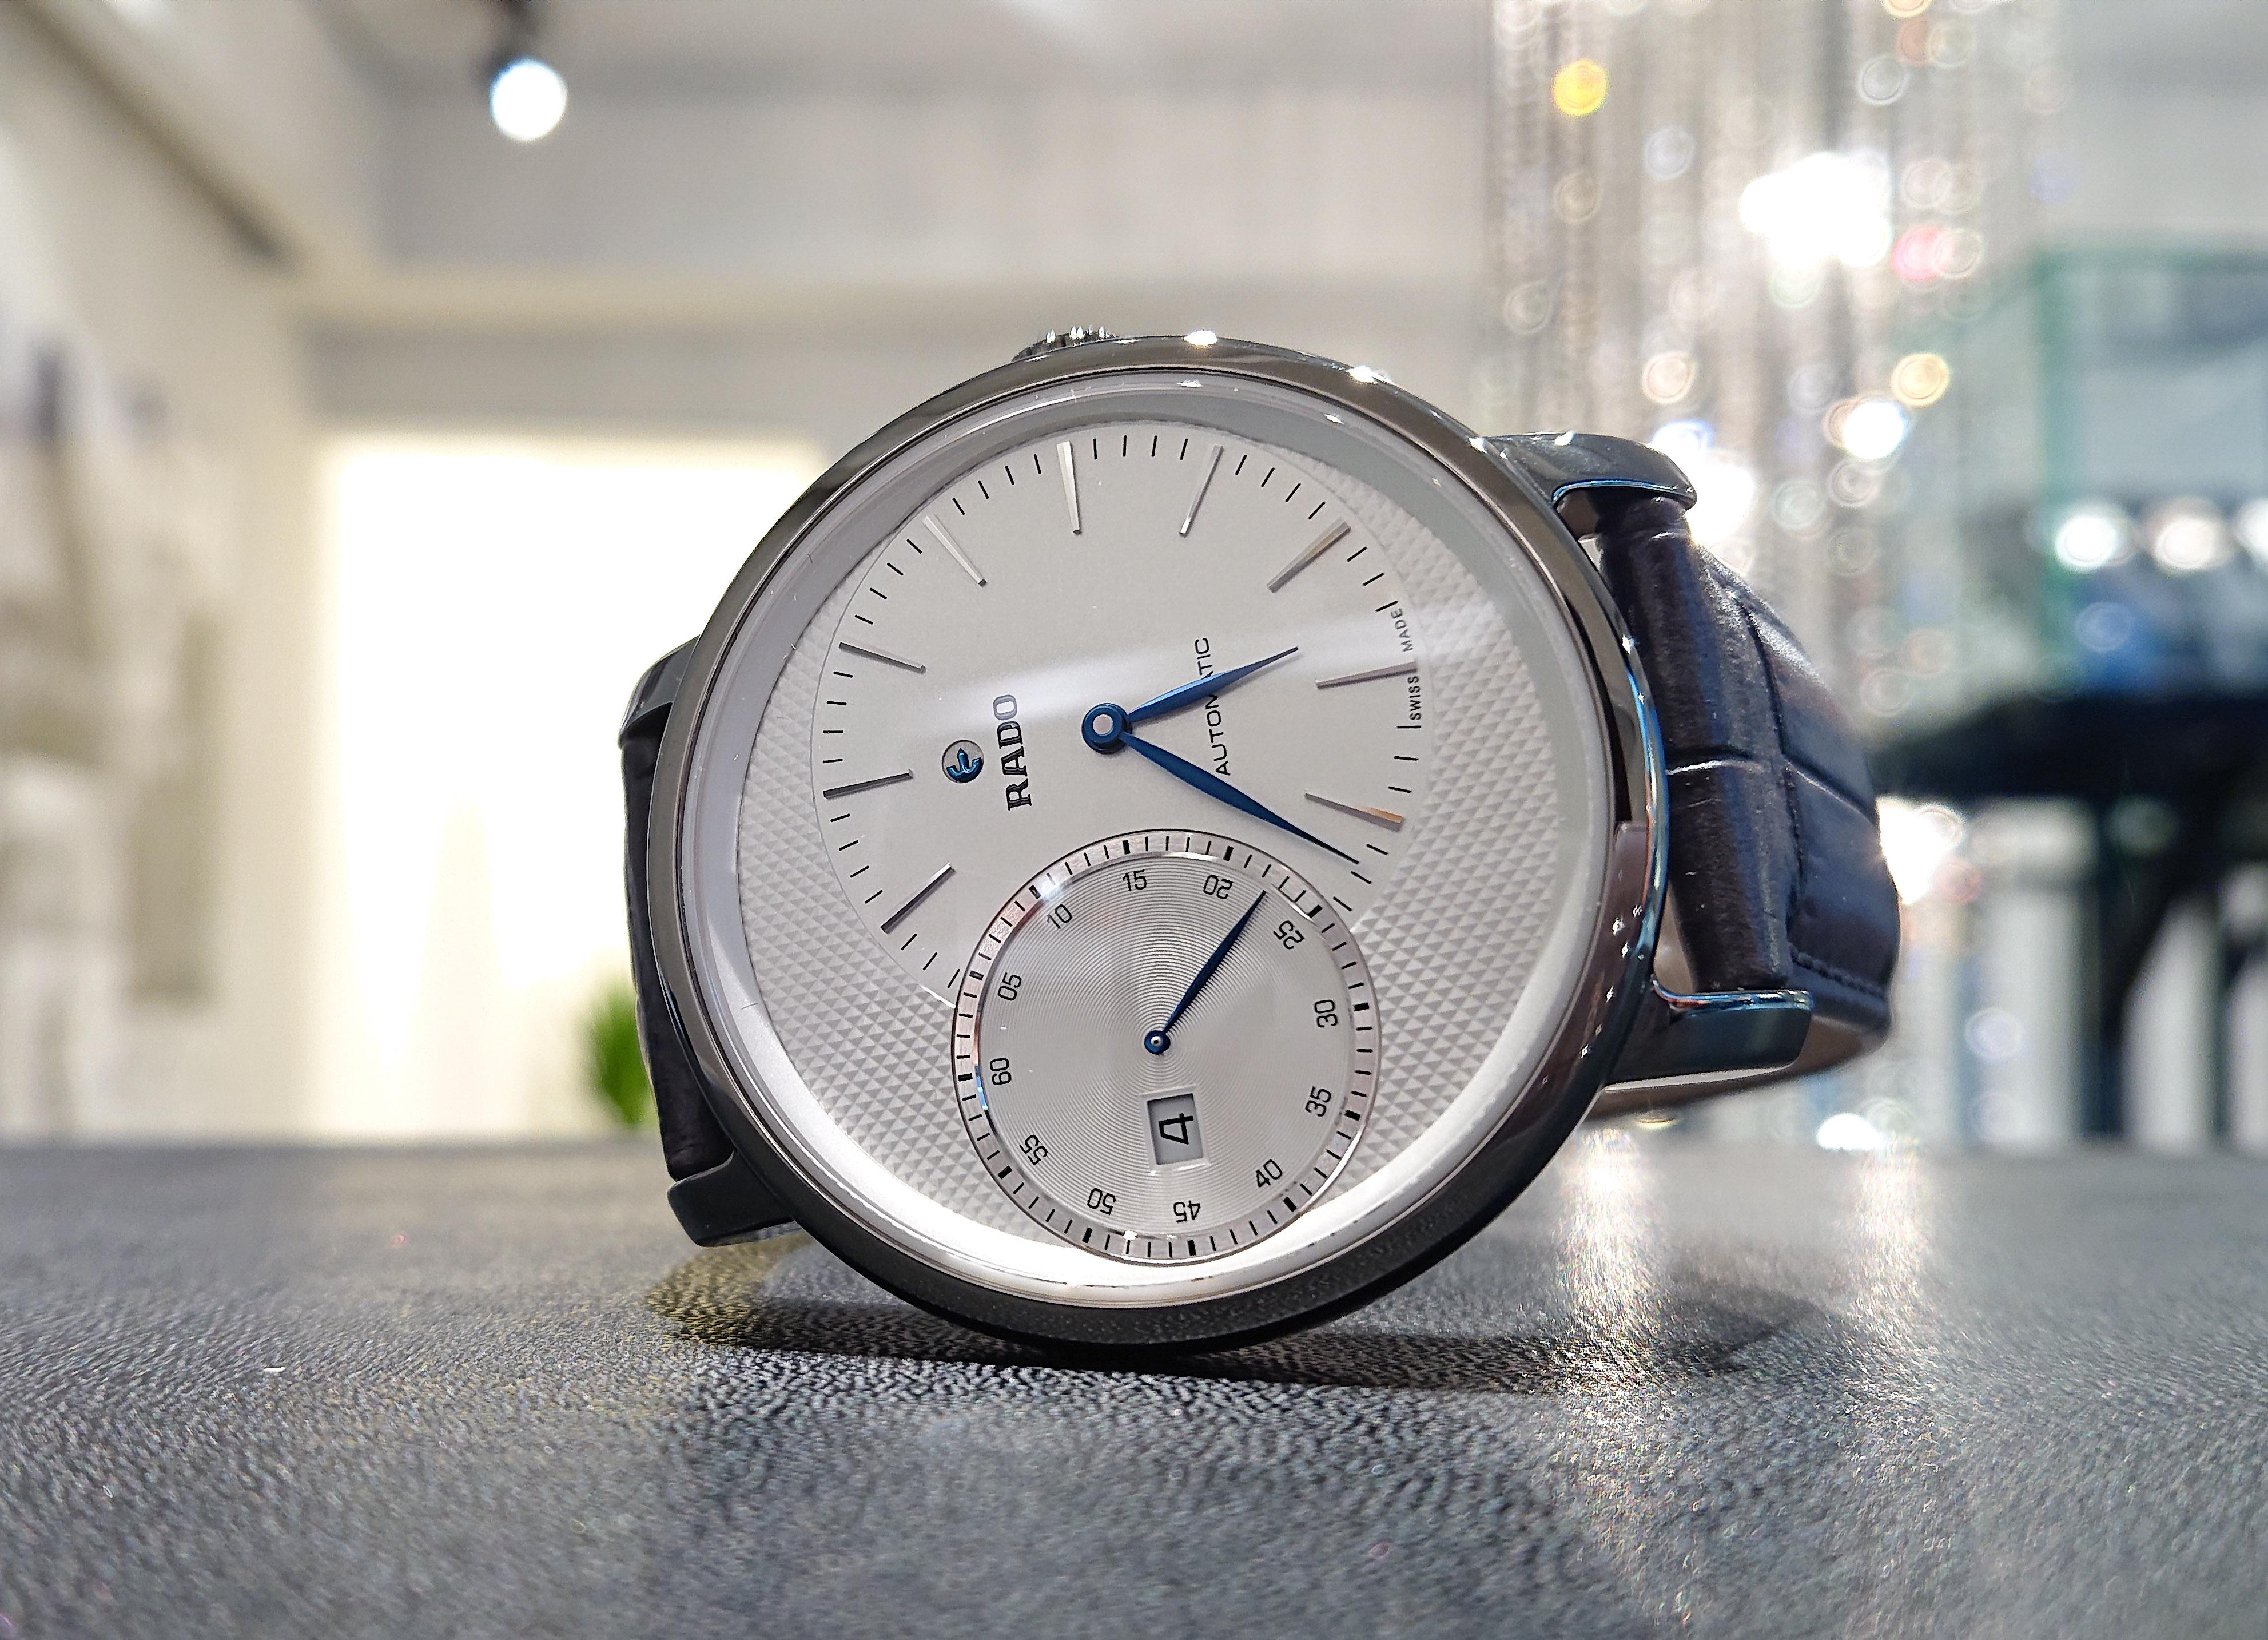 【RADO ラドー】DiaMaster Automatic Grande Seconde ダイヤマスター グランドセコンド(グレー)/国内正規品 腕時計